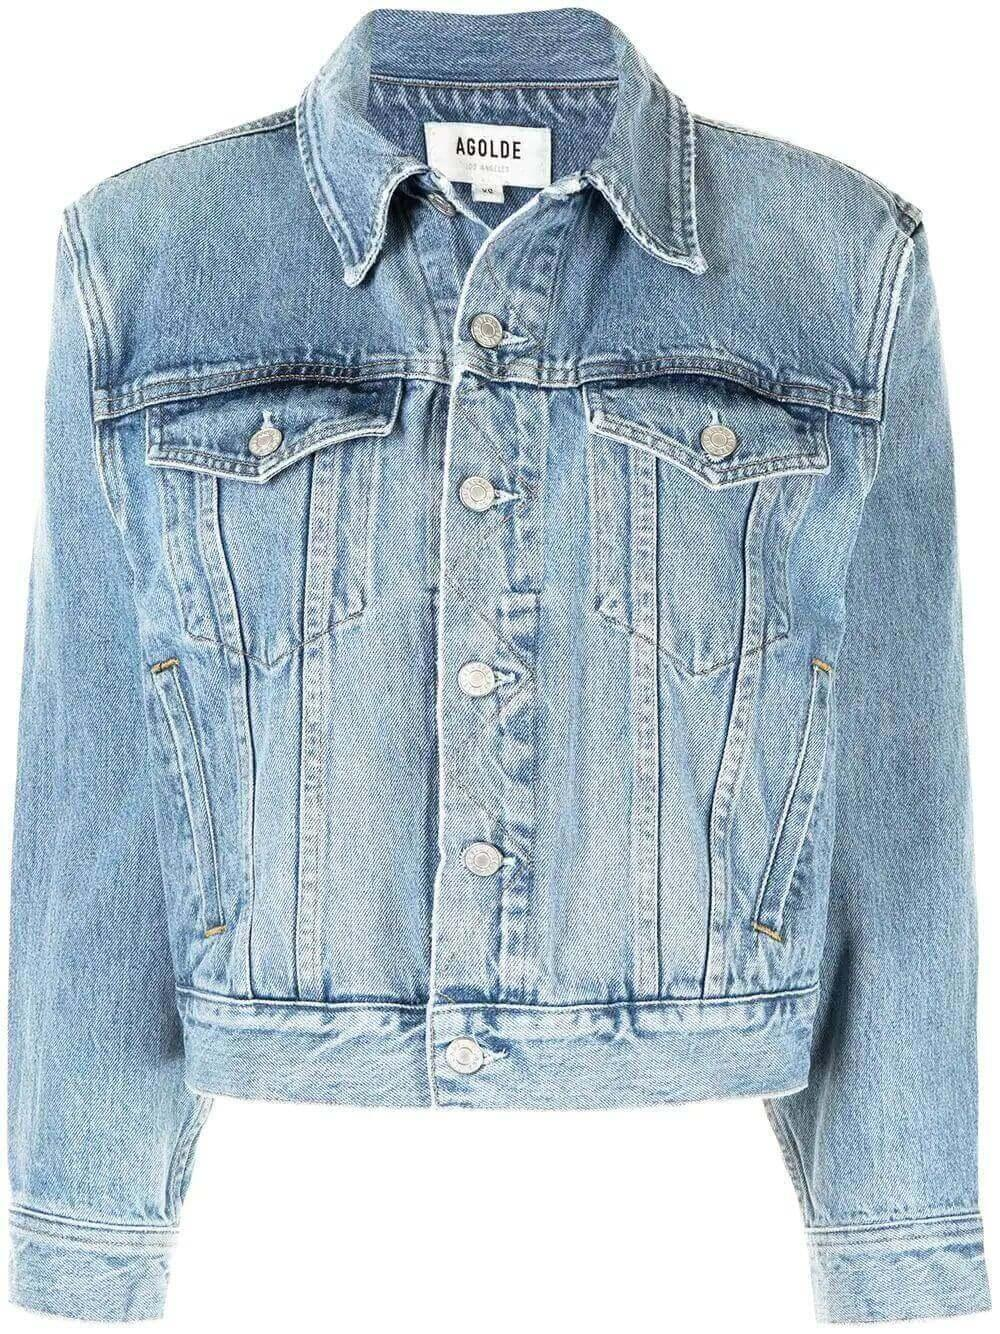 Blanca Jean Jacket Item # A5013B-1206